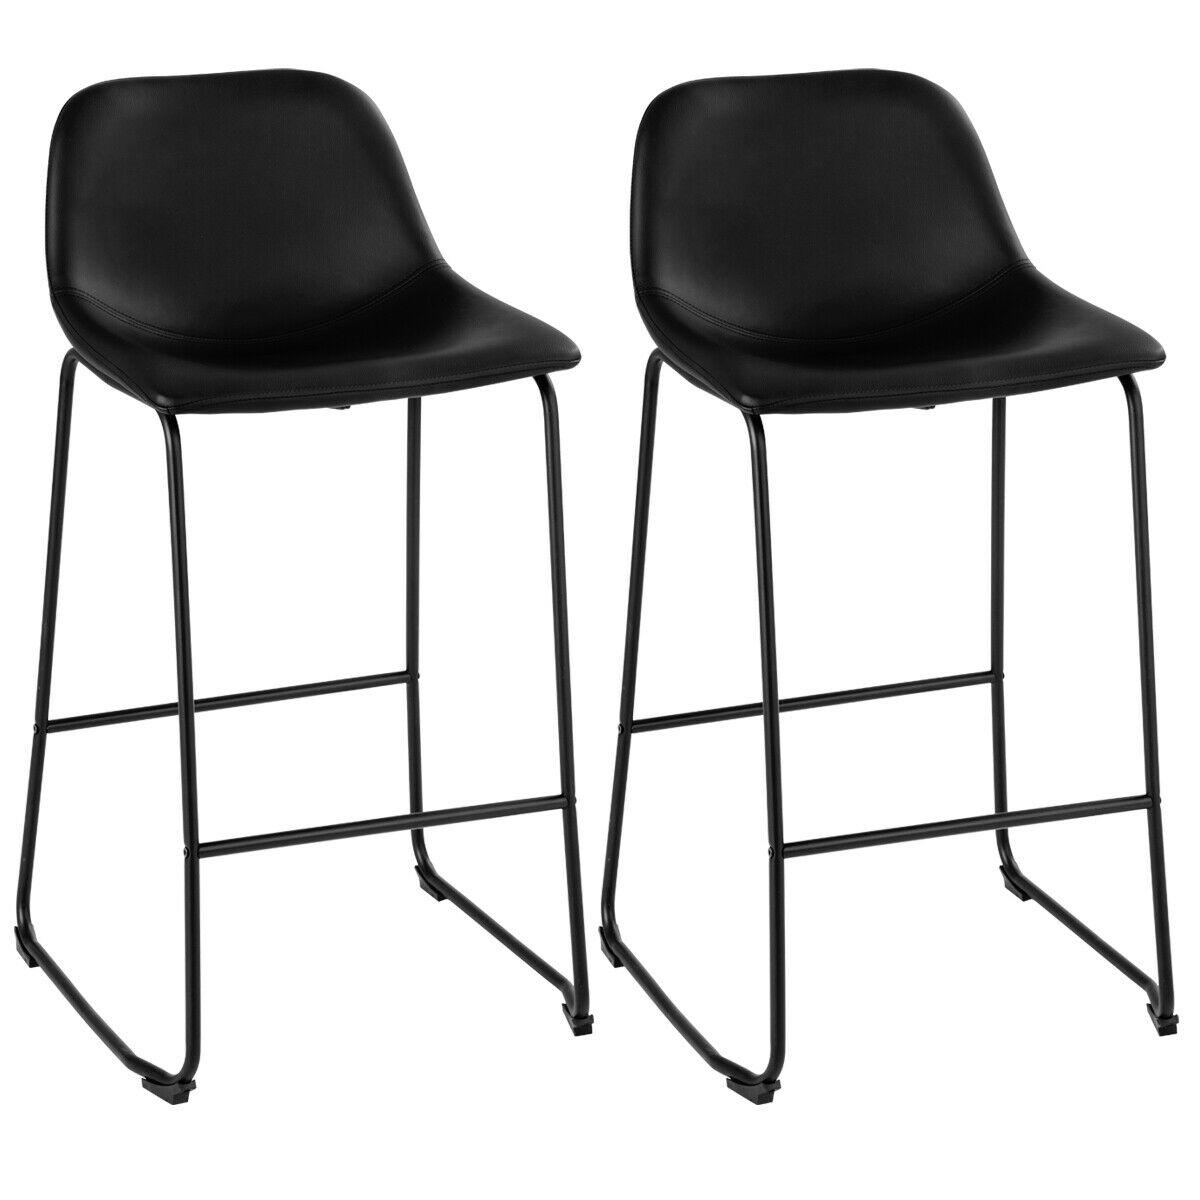 Costway Set Of 2 PU Leather Vintage Pub Barstools Dining Side Chairs W/Metal Legs Black